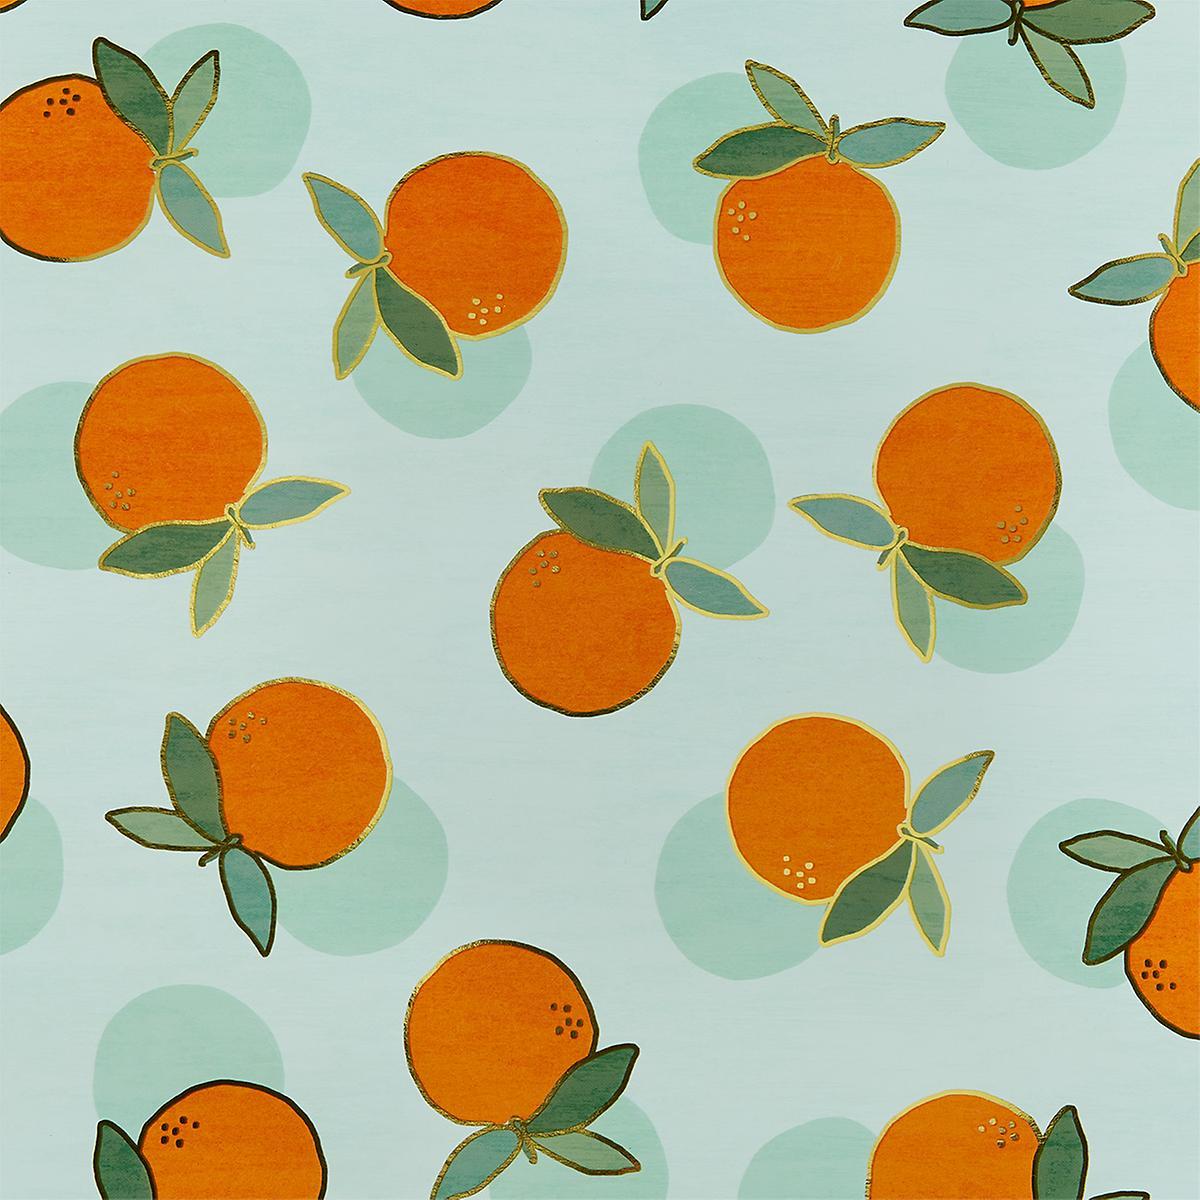 Orange Crush Foil Wrapping Paper